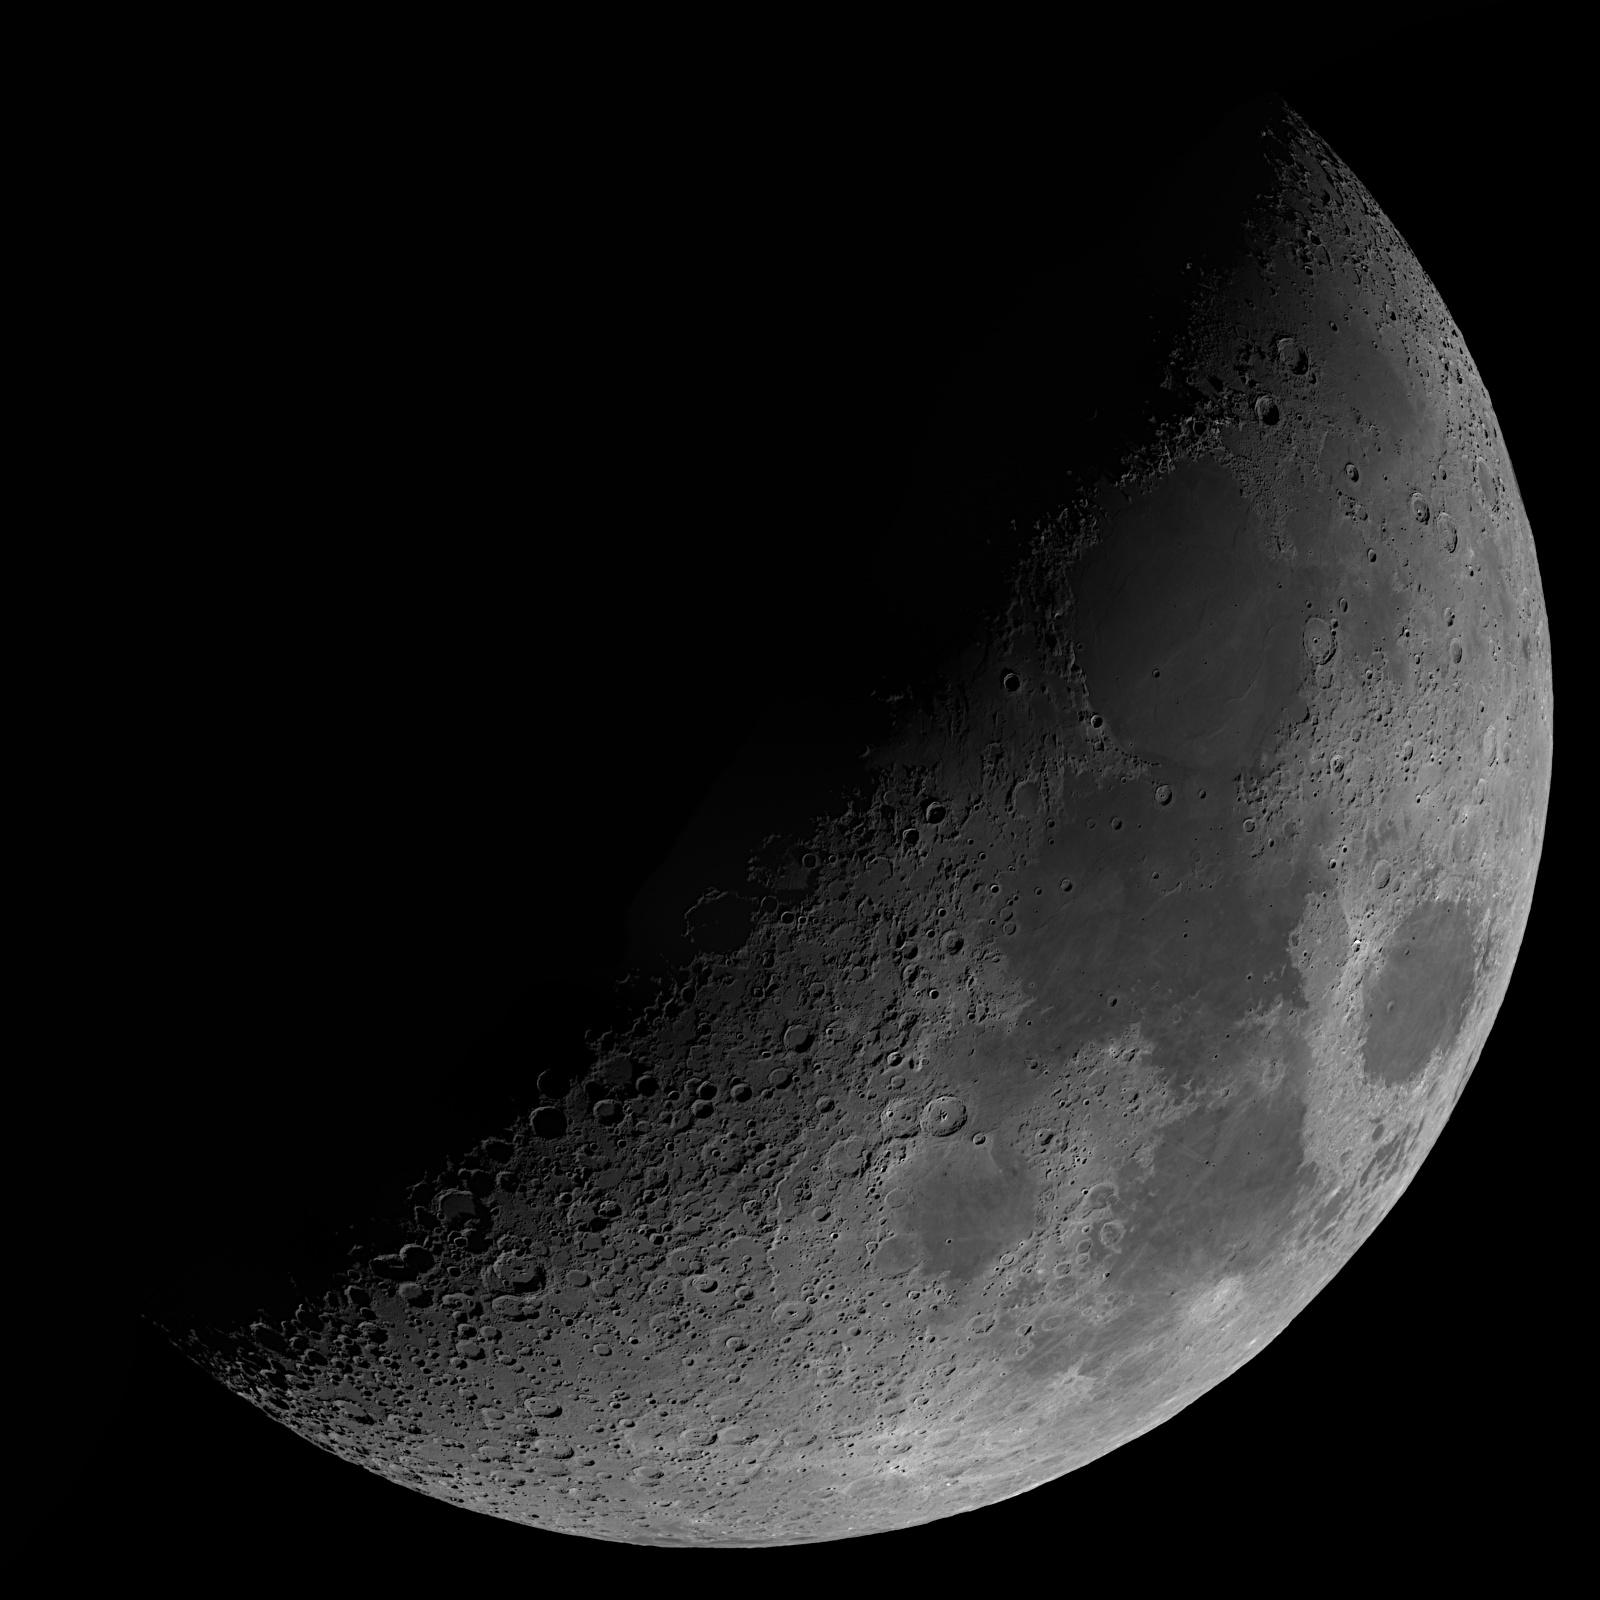 moon_stack_sharp.thumb.jpg.90df4403e55474f6d2daeb0afa31324e.jpg